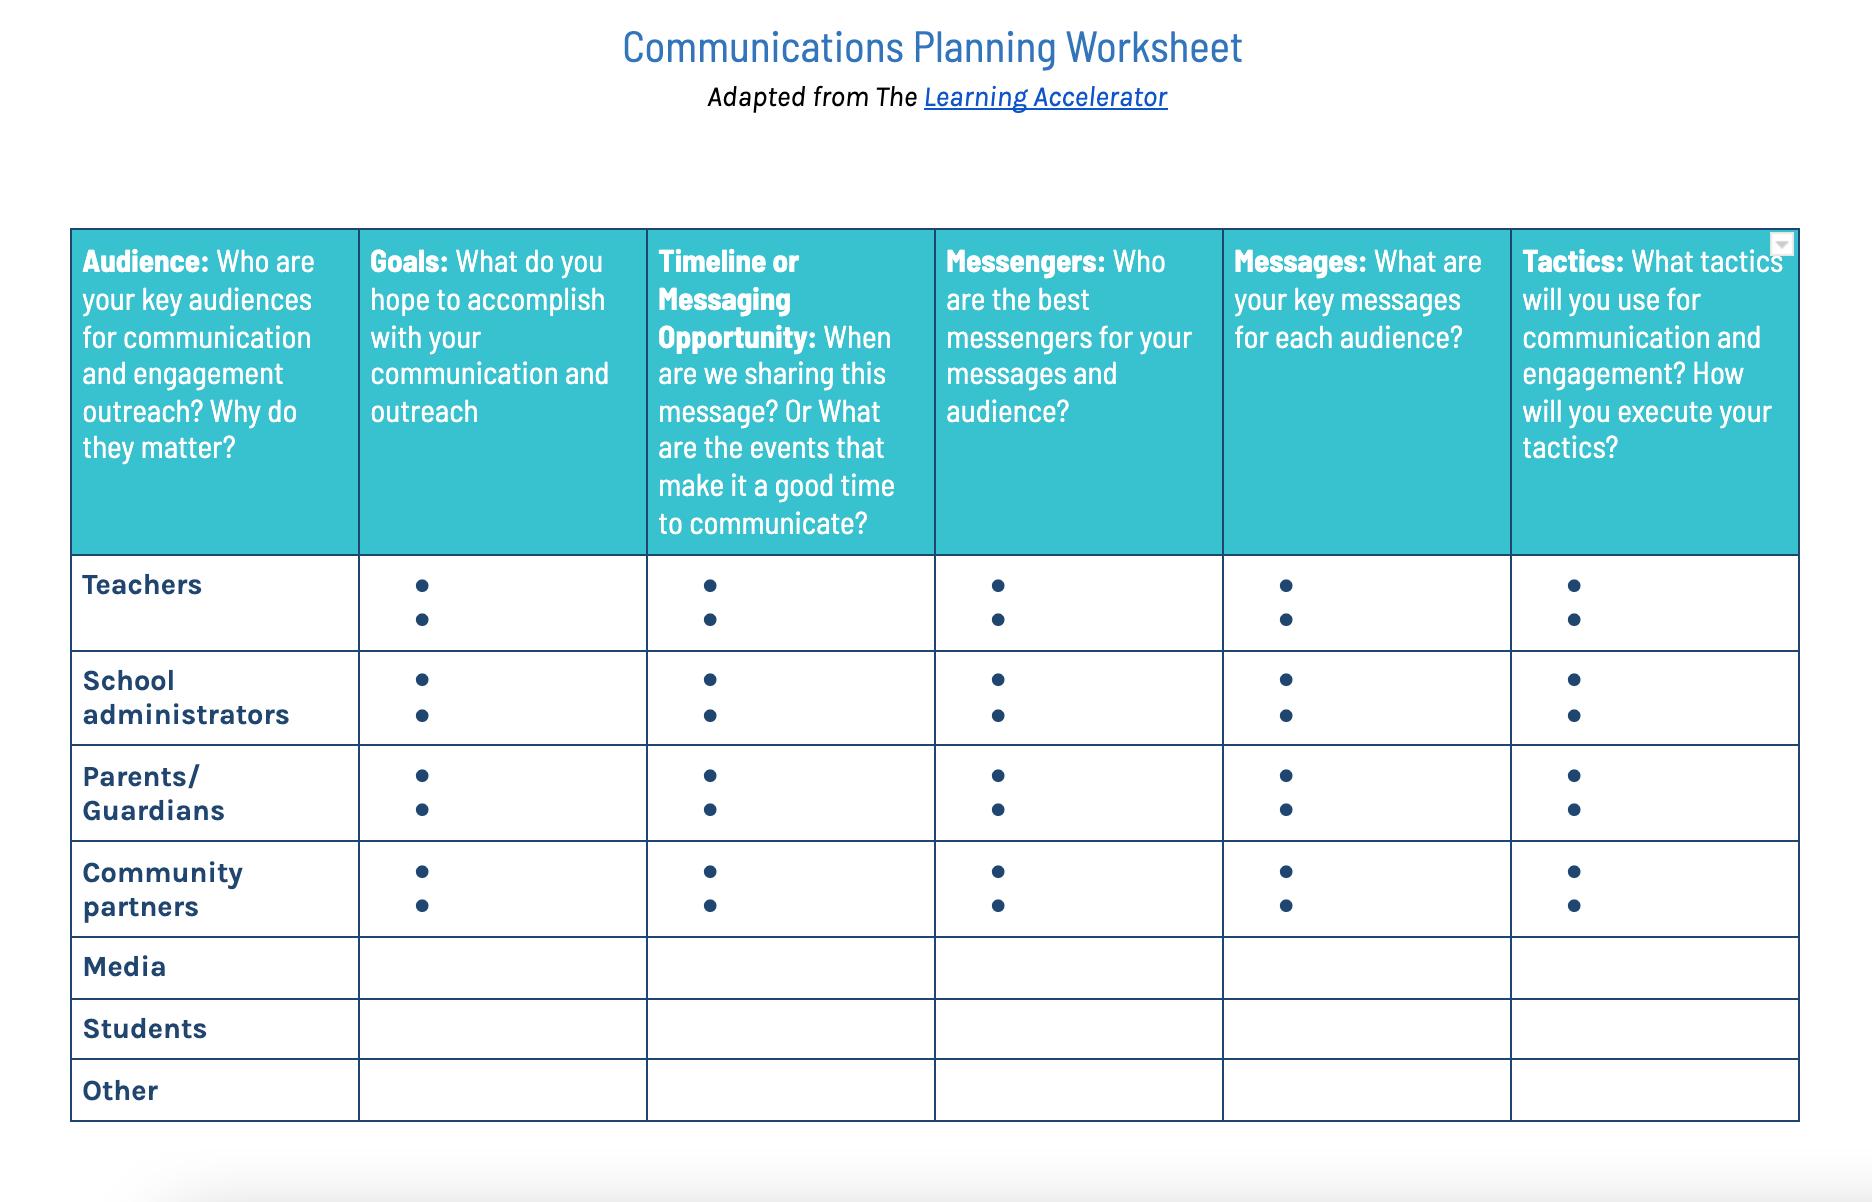 Communications planning worksheet